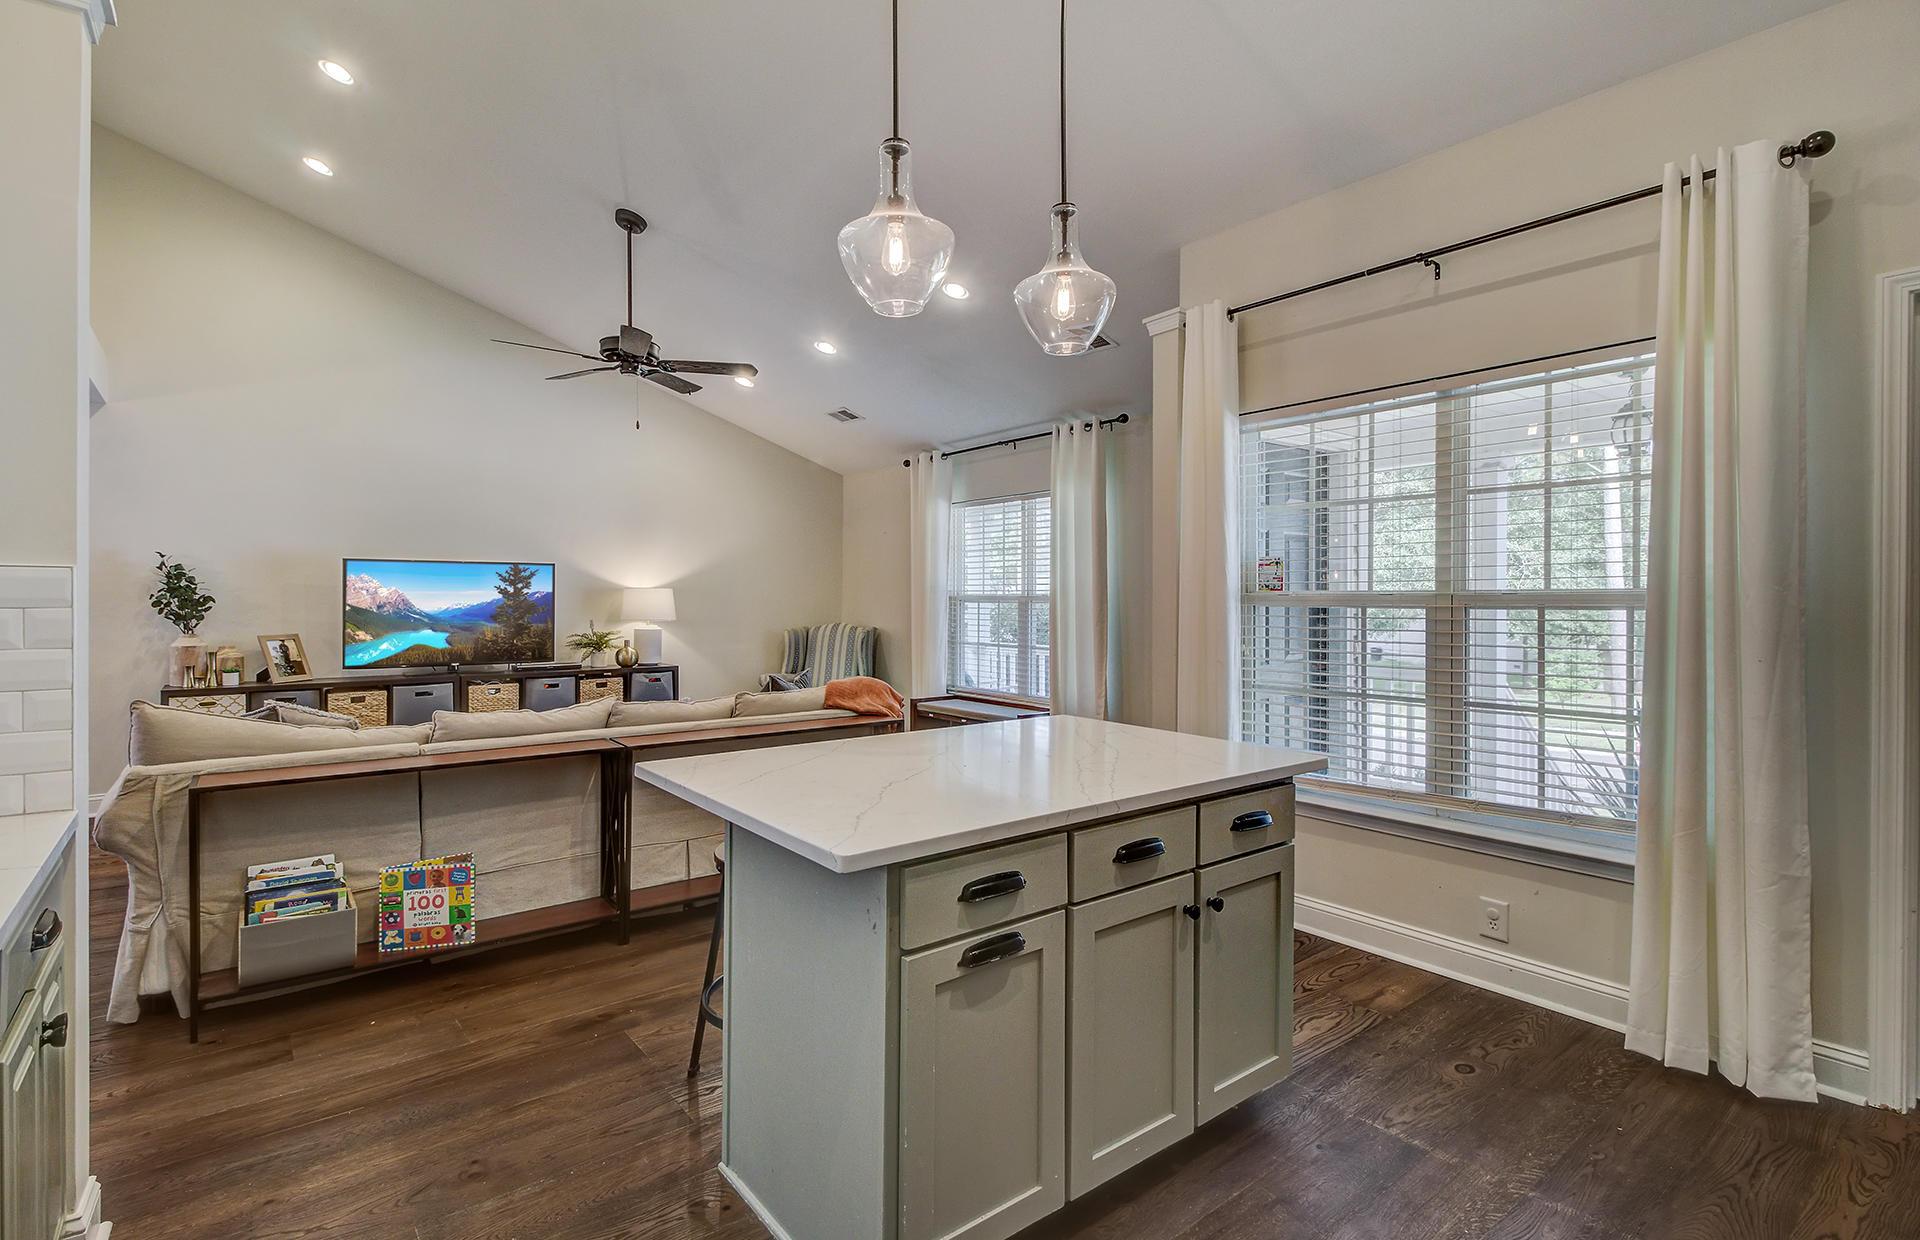 Kennsington Homes For Sale - 108 Heatherlock, Hanahan, SC - 19